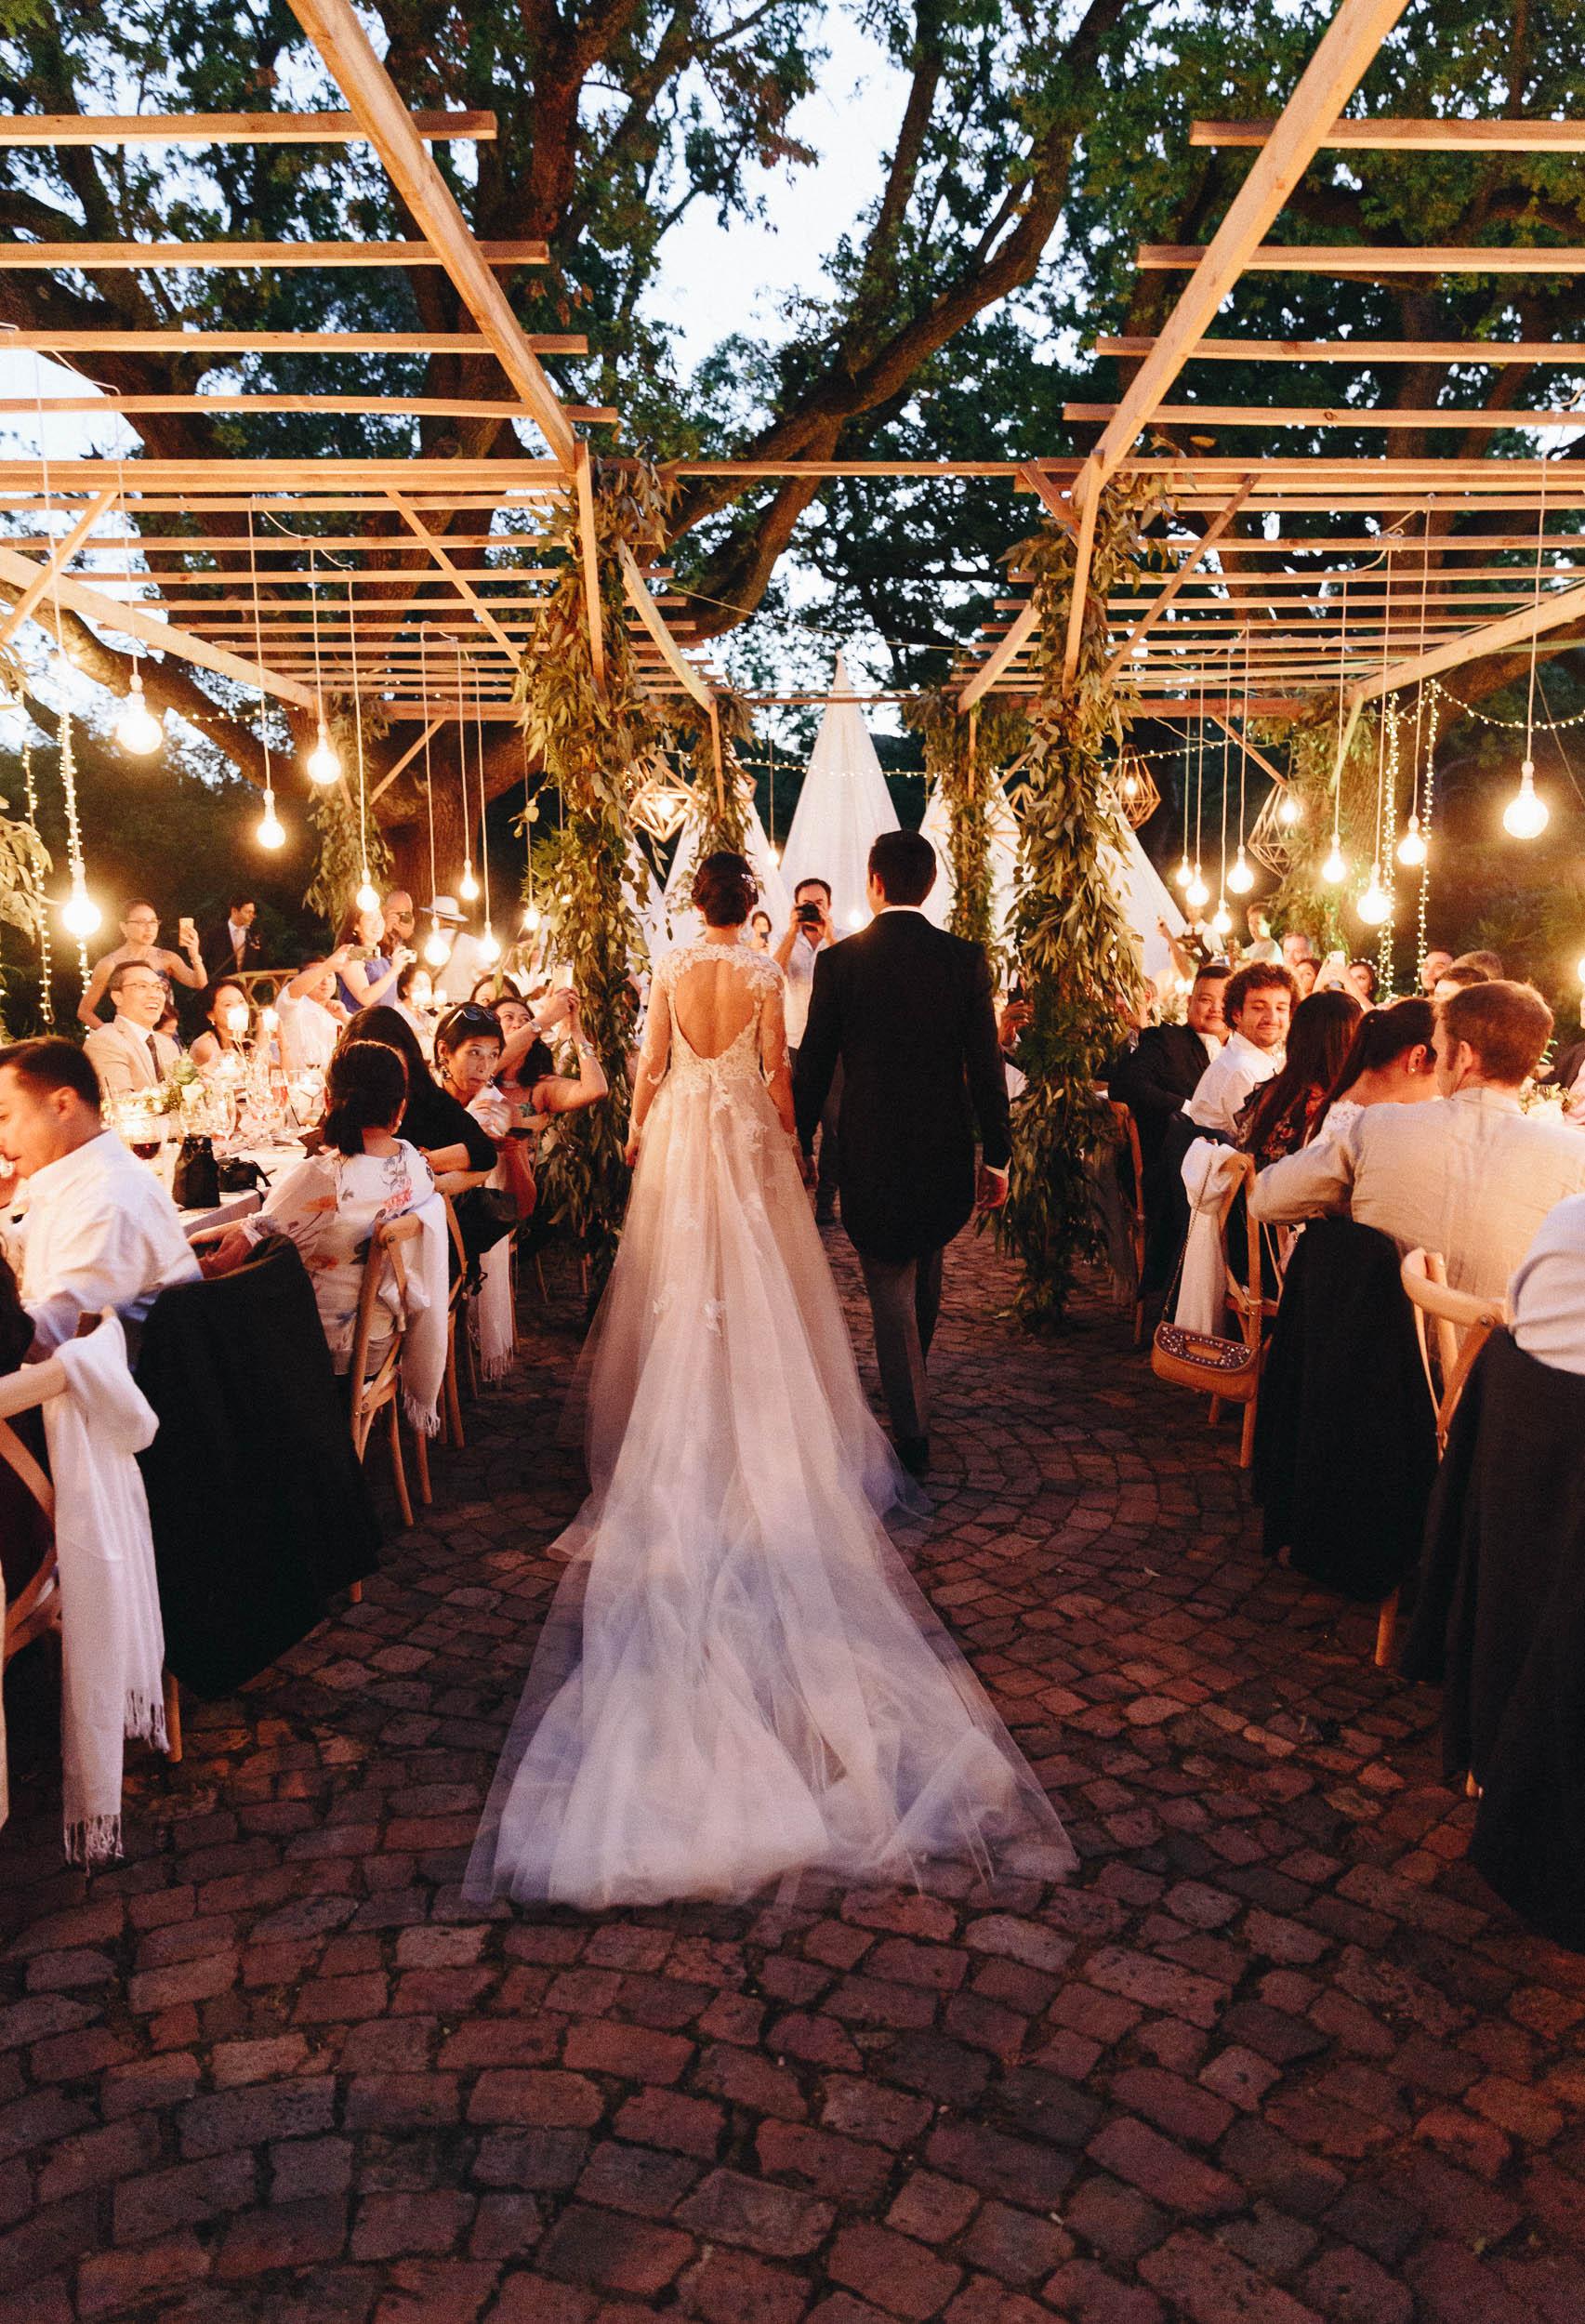 Jenny-Rockett-John-Scranton-Cape-Town-Wedding-Photographer-Andrea-Kellan-206.jpg